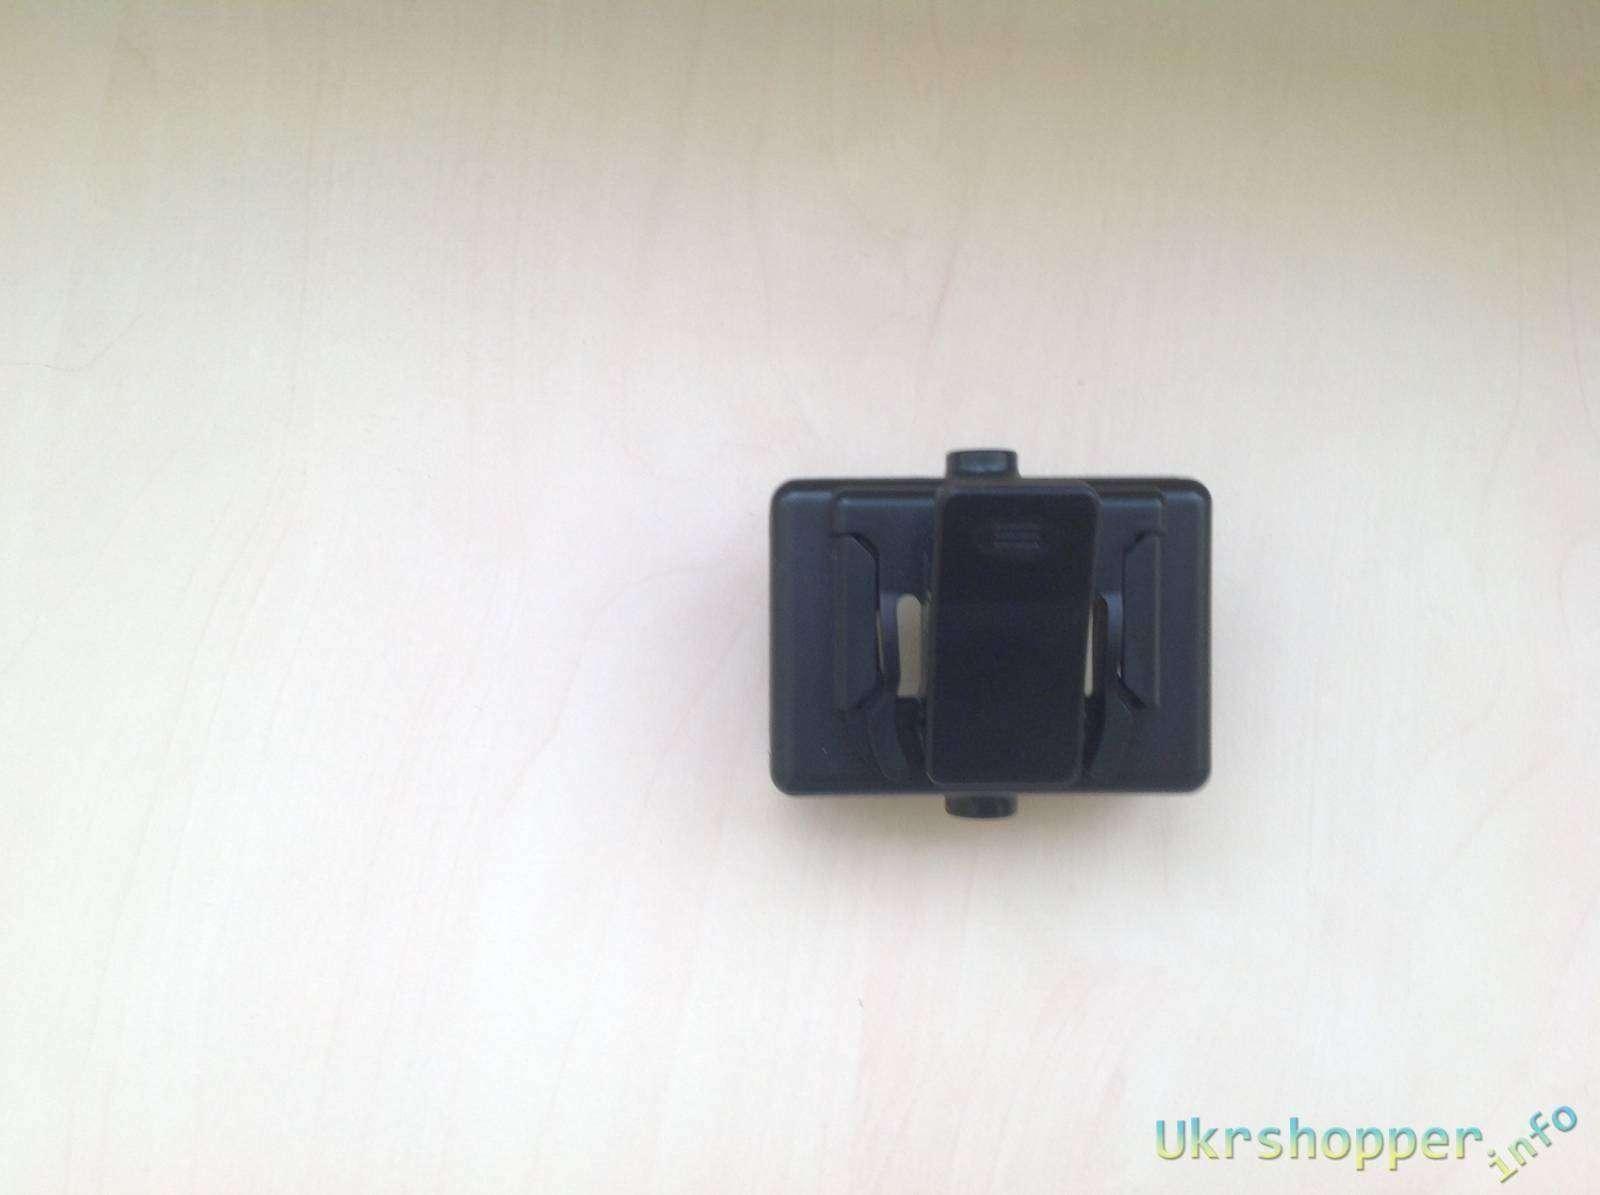 Aliexpress: Экшен камера SJ4000+ сравнение с GoPro